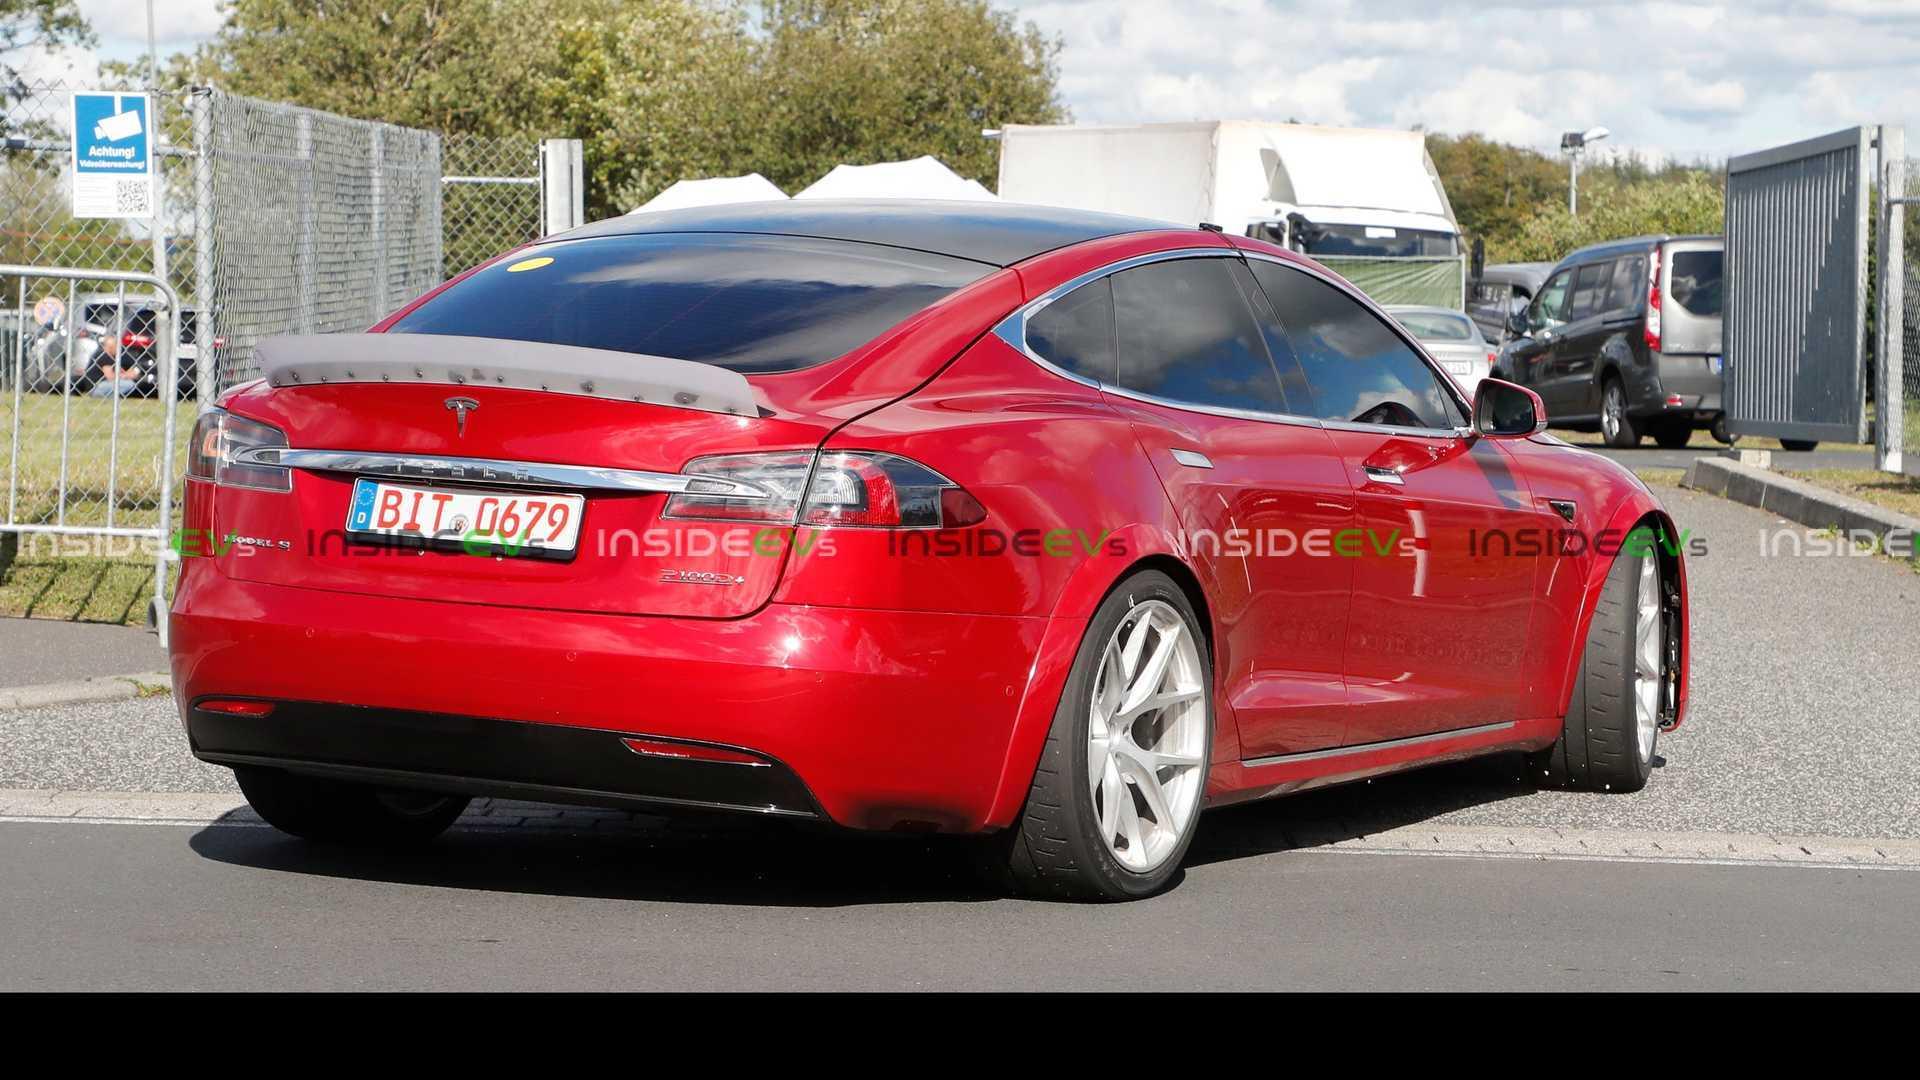 Tesla Model S MOD / Plaid 45